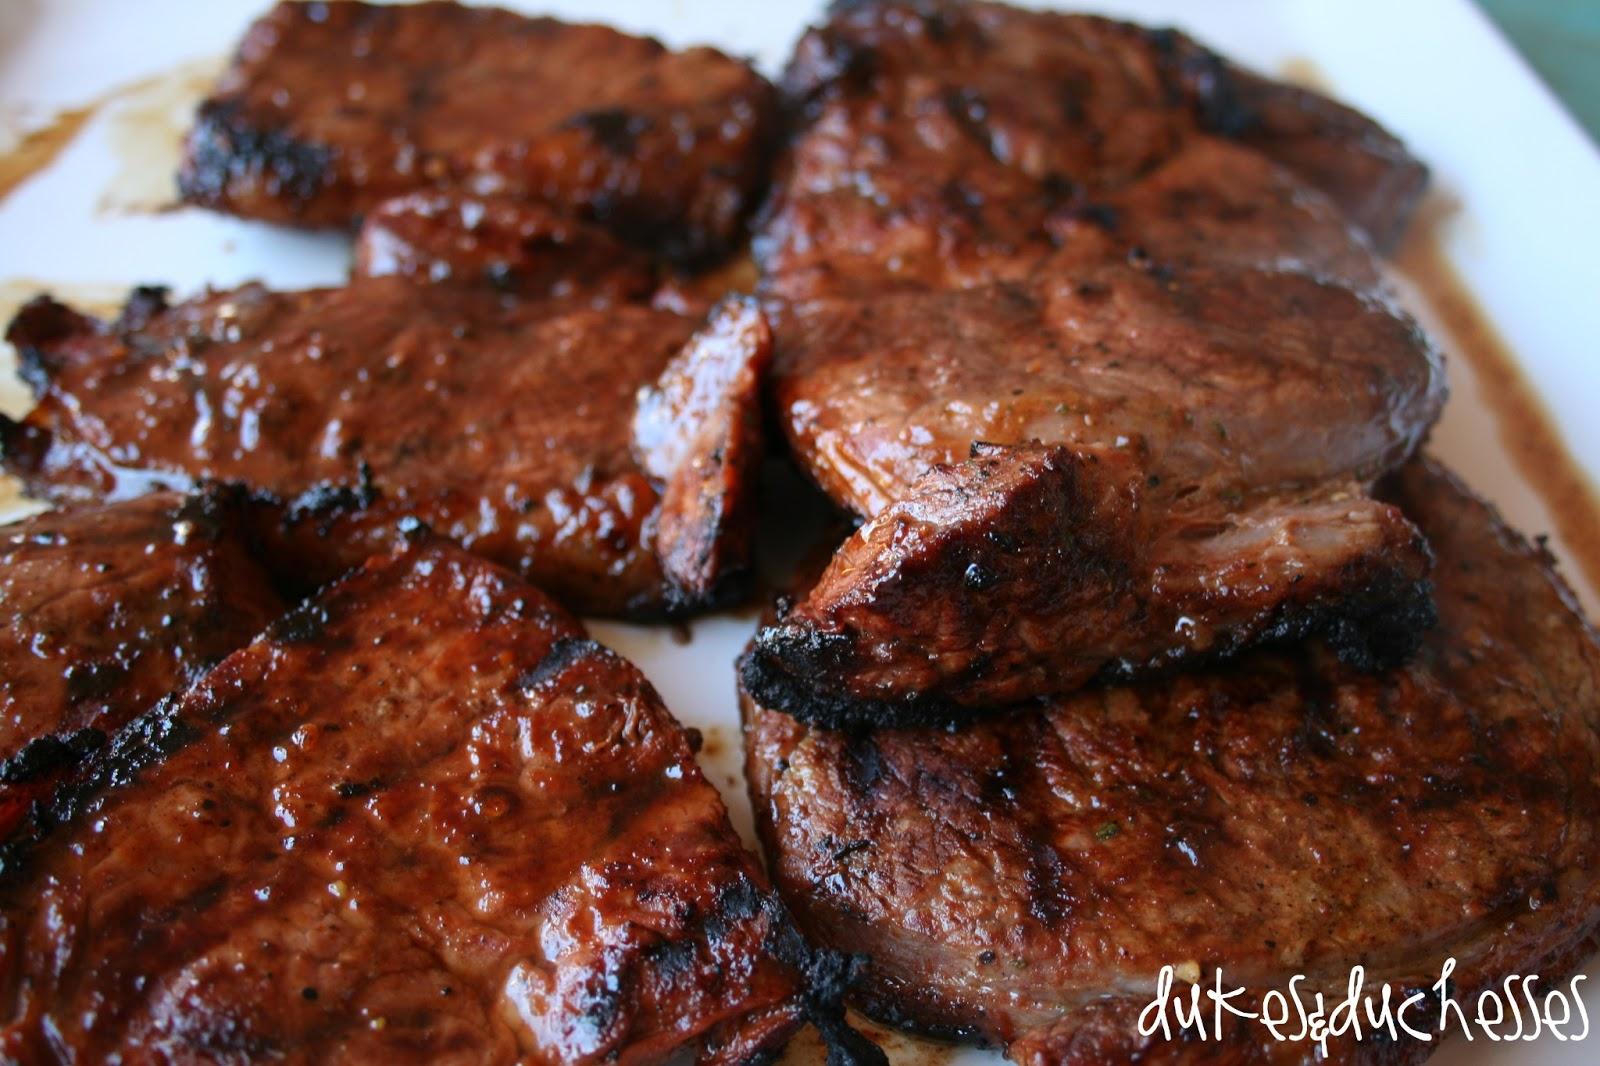 a backyard steak grill off dukes and duchesses